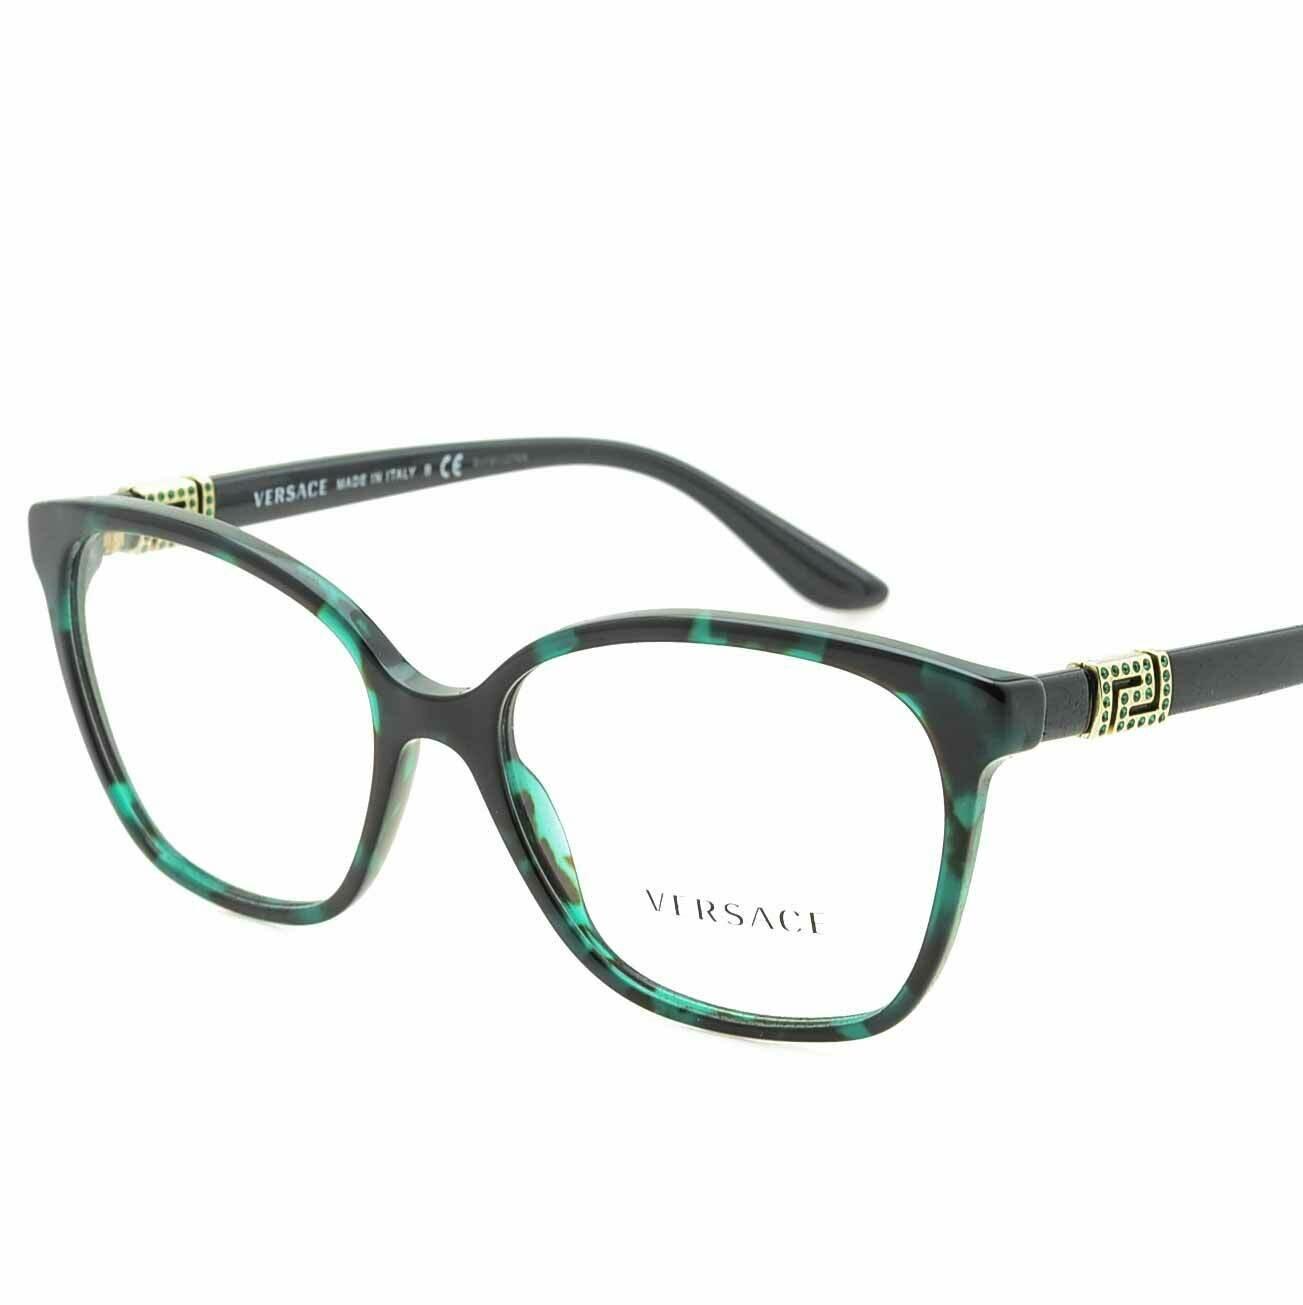 Versace 3235-b